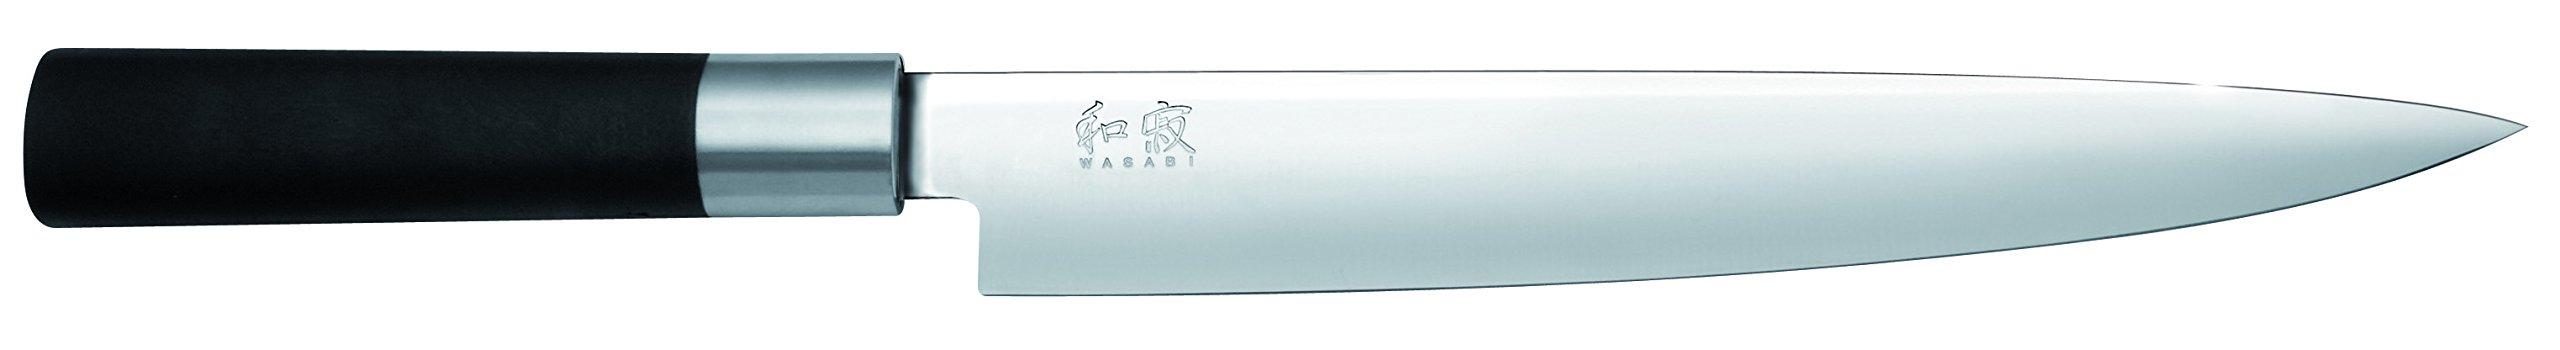 Wasabi Black Slicing Knife